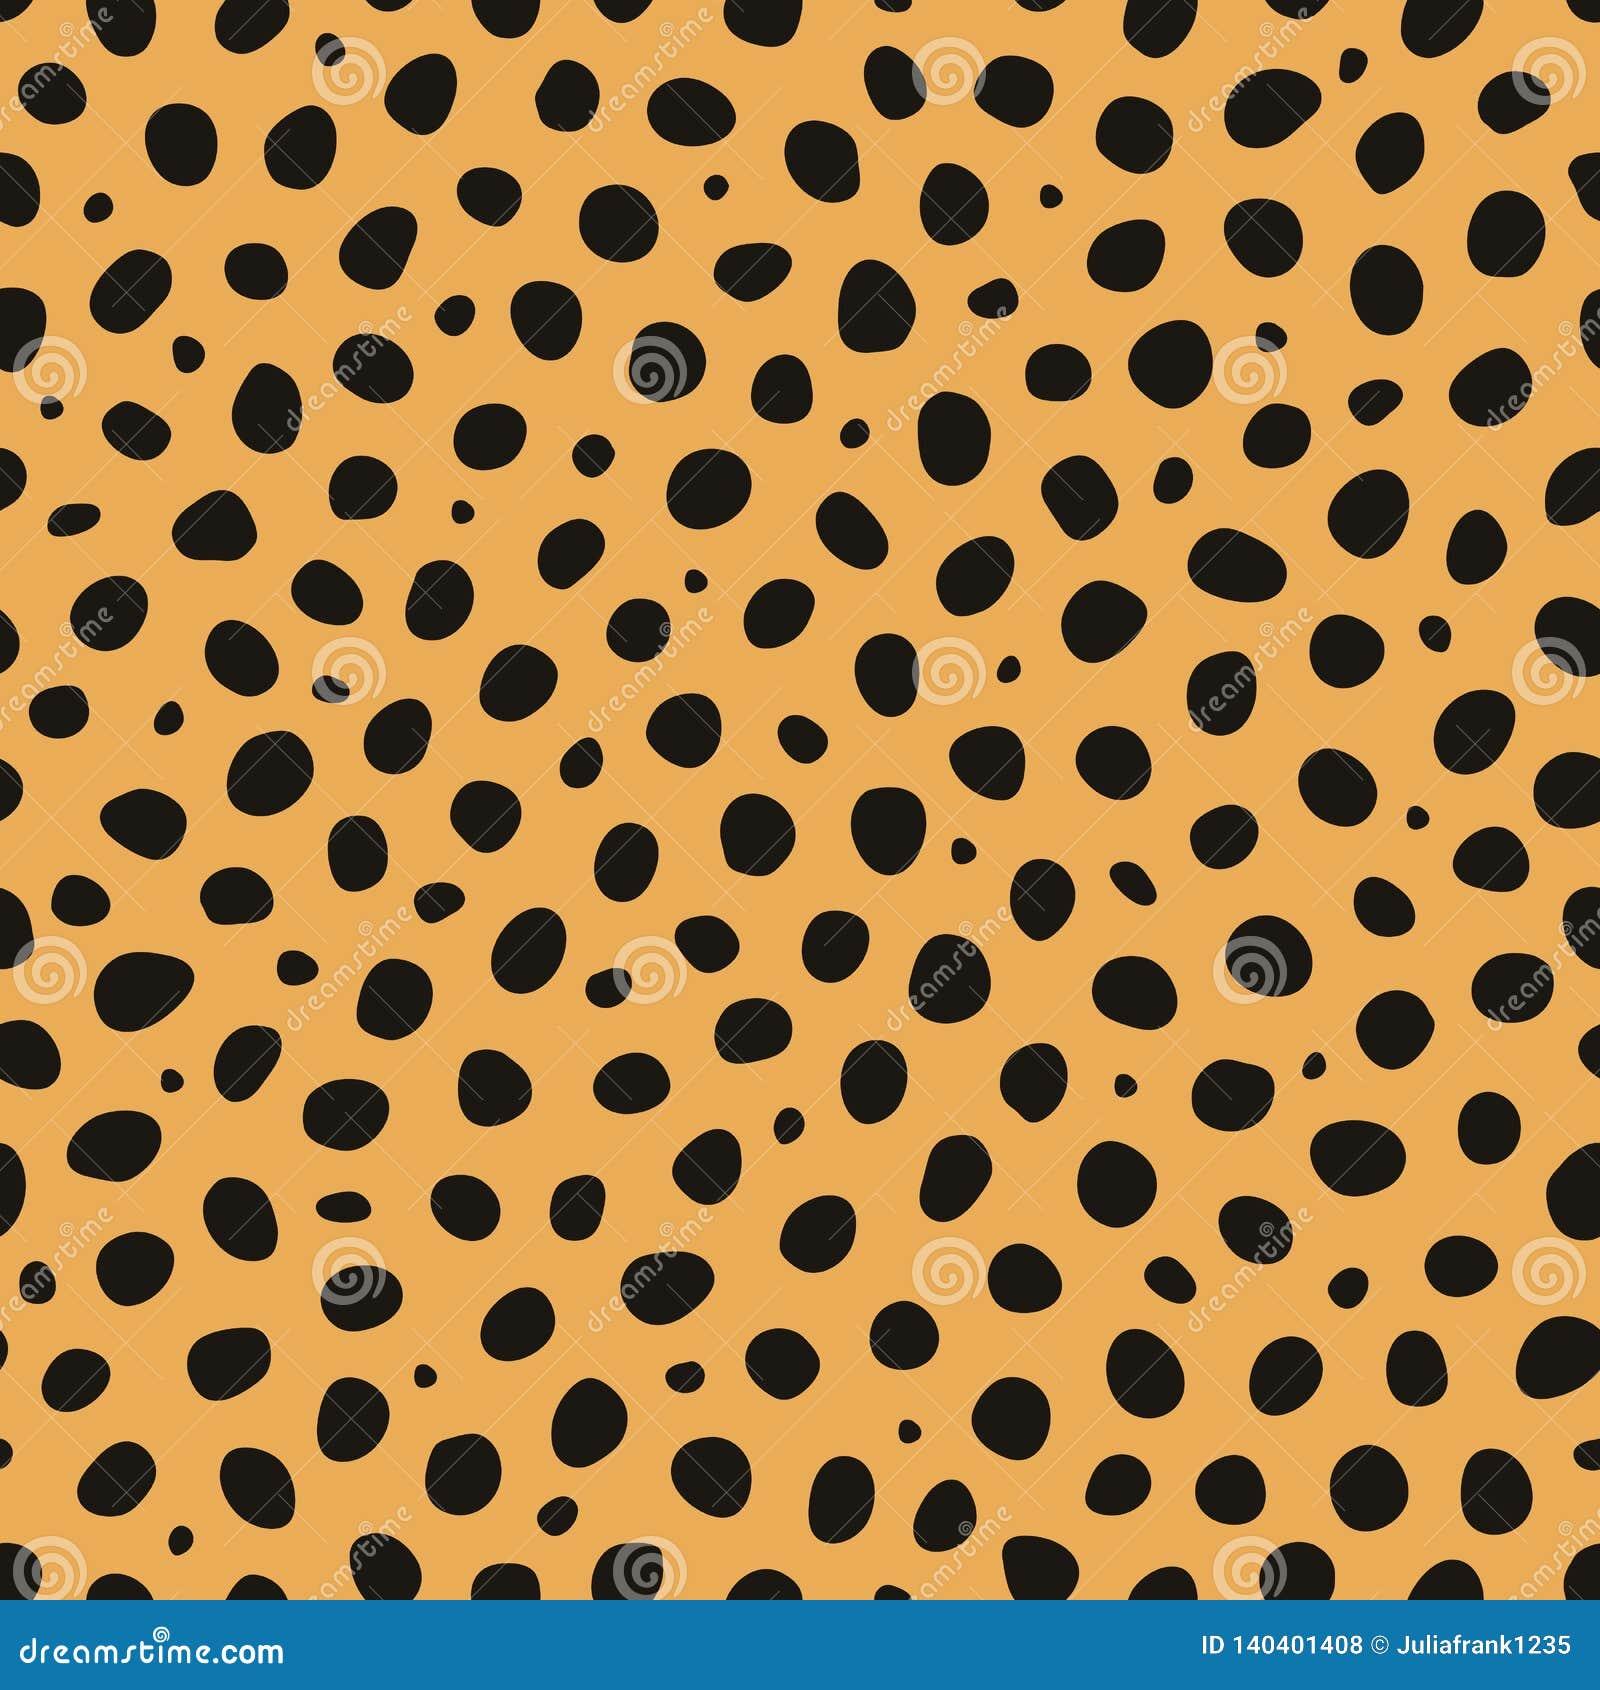 Cheetah Animal Print Vector Seamless Pattern Stock Vector ...